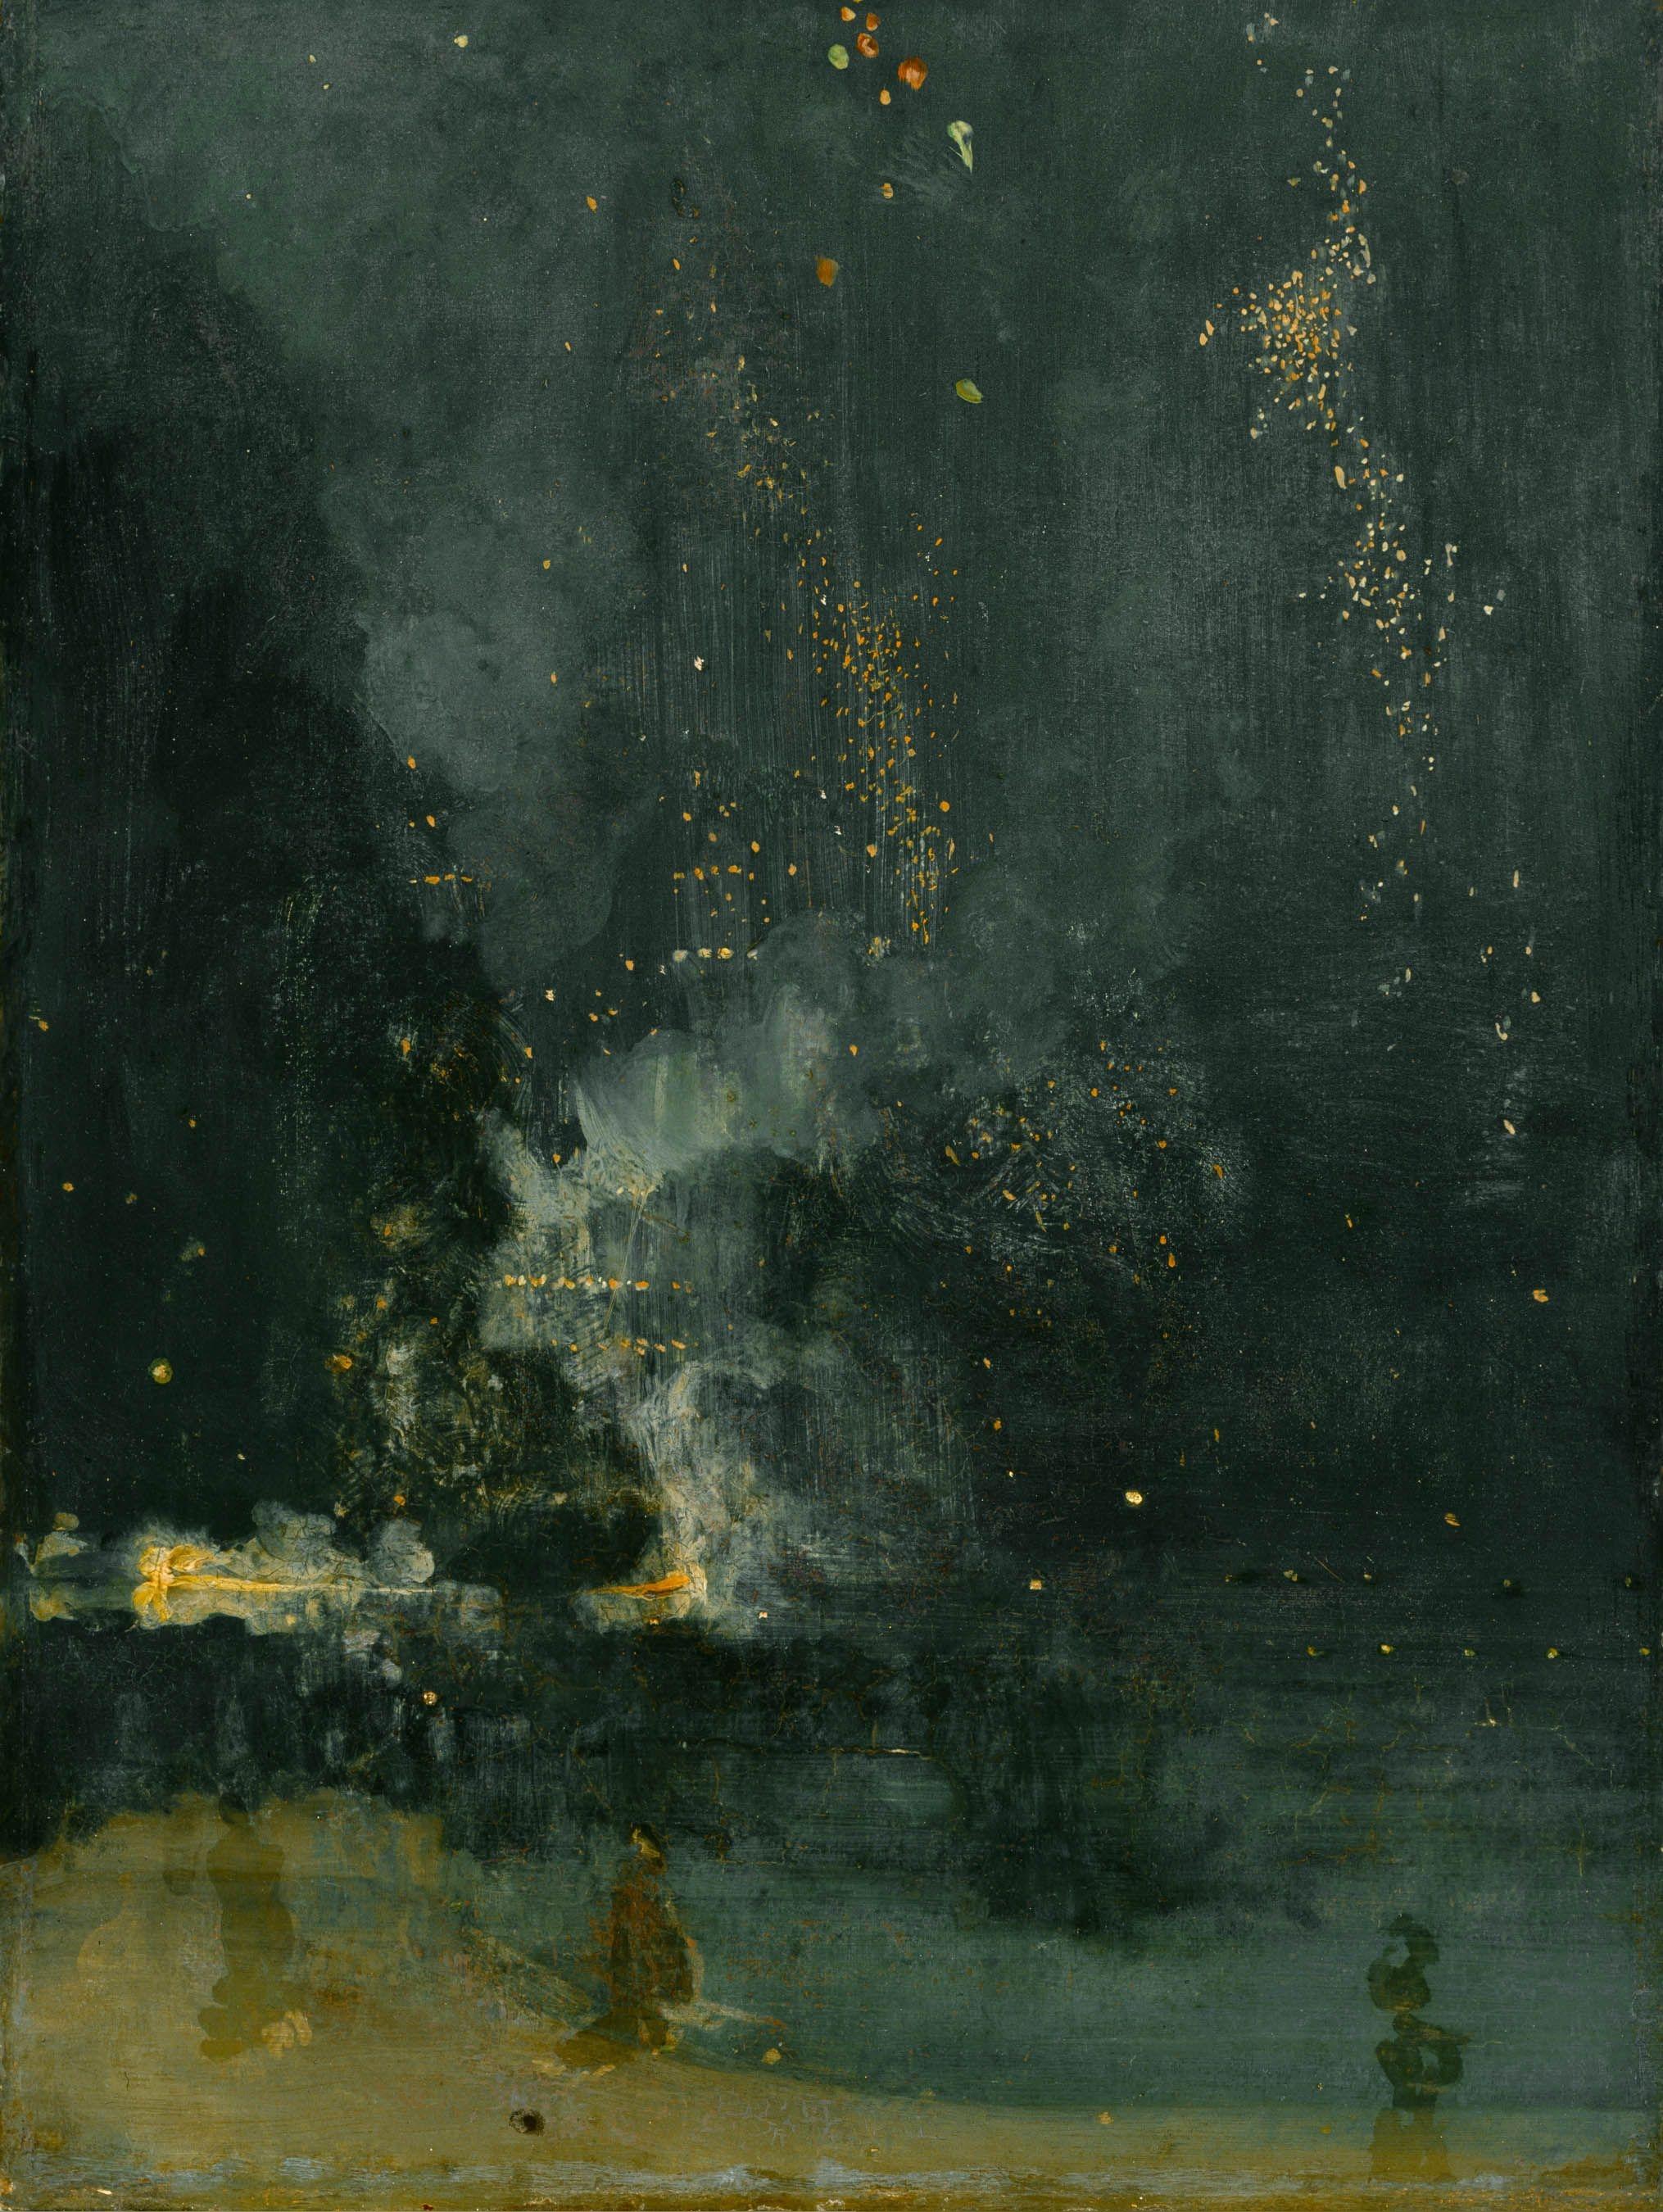 Fig. 2 James Abbott McNeil  l Whistler   Nocturne in Black an    d Gold: The Falling Rocket   1874 Oil on canvas